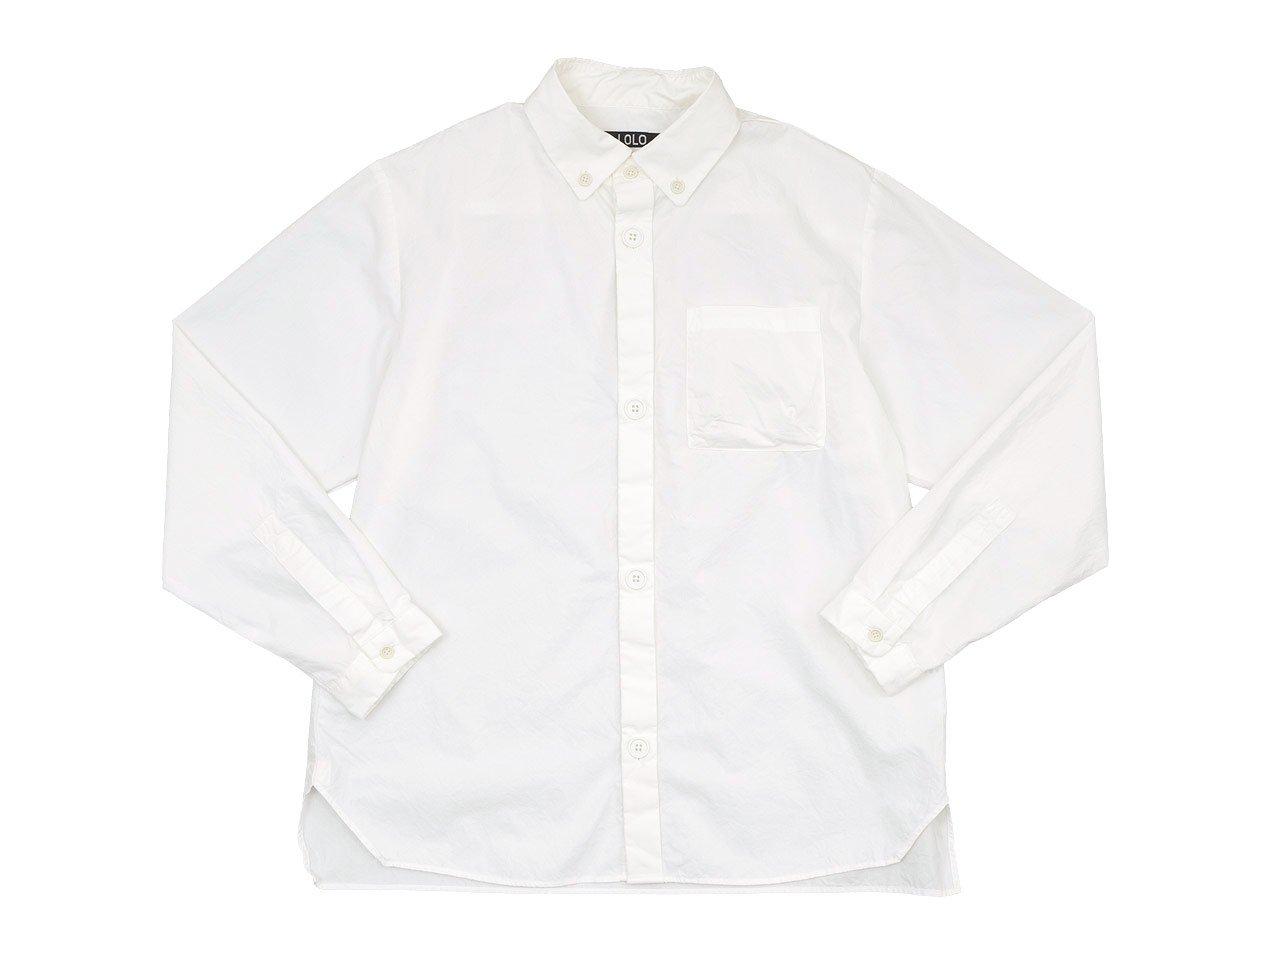 LOLO 40タイプライター ボタンダウンシャツ WHITE